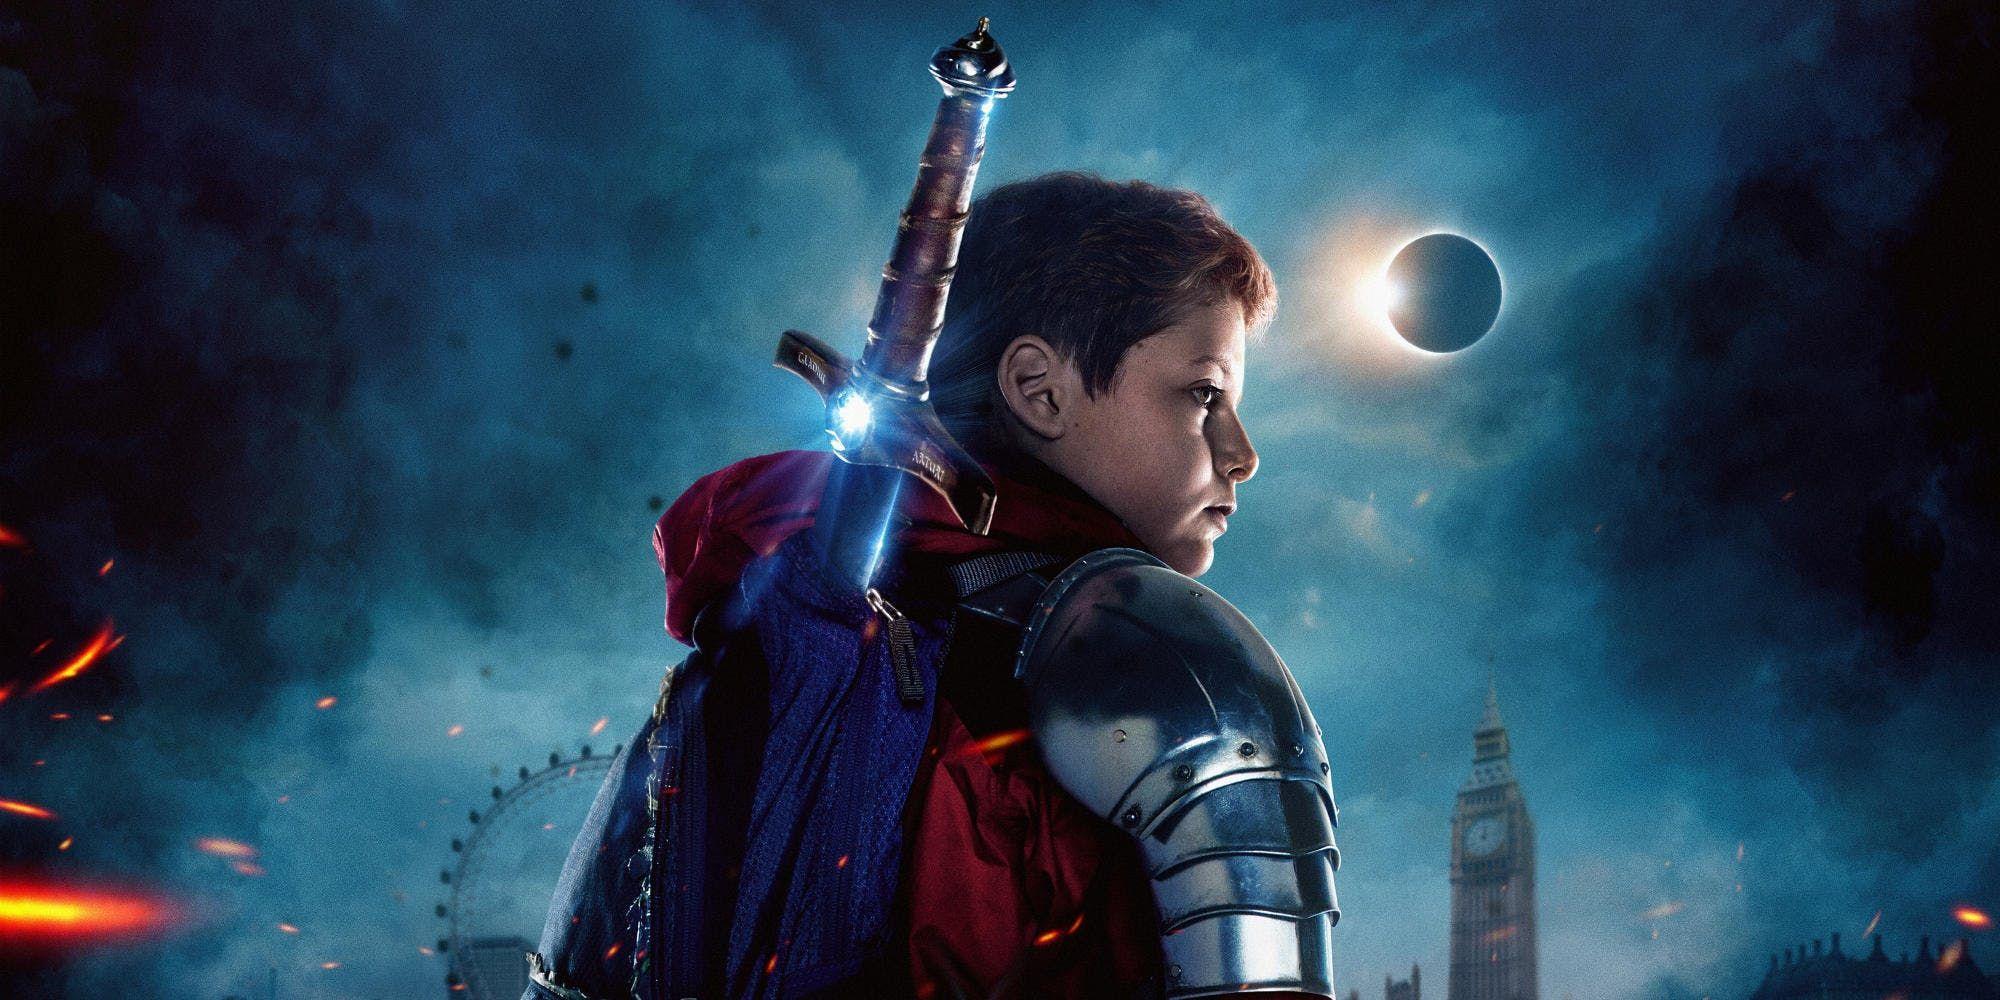 Movie Poster 2019: Attack The Block Director Joe Cornish Discusses The Kid